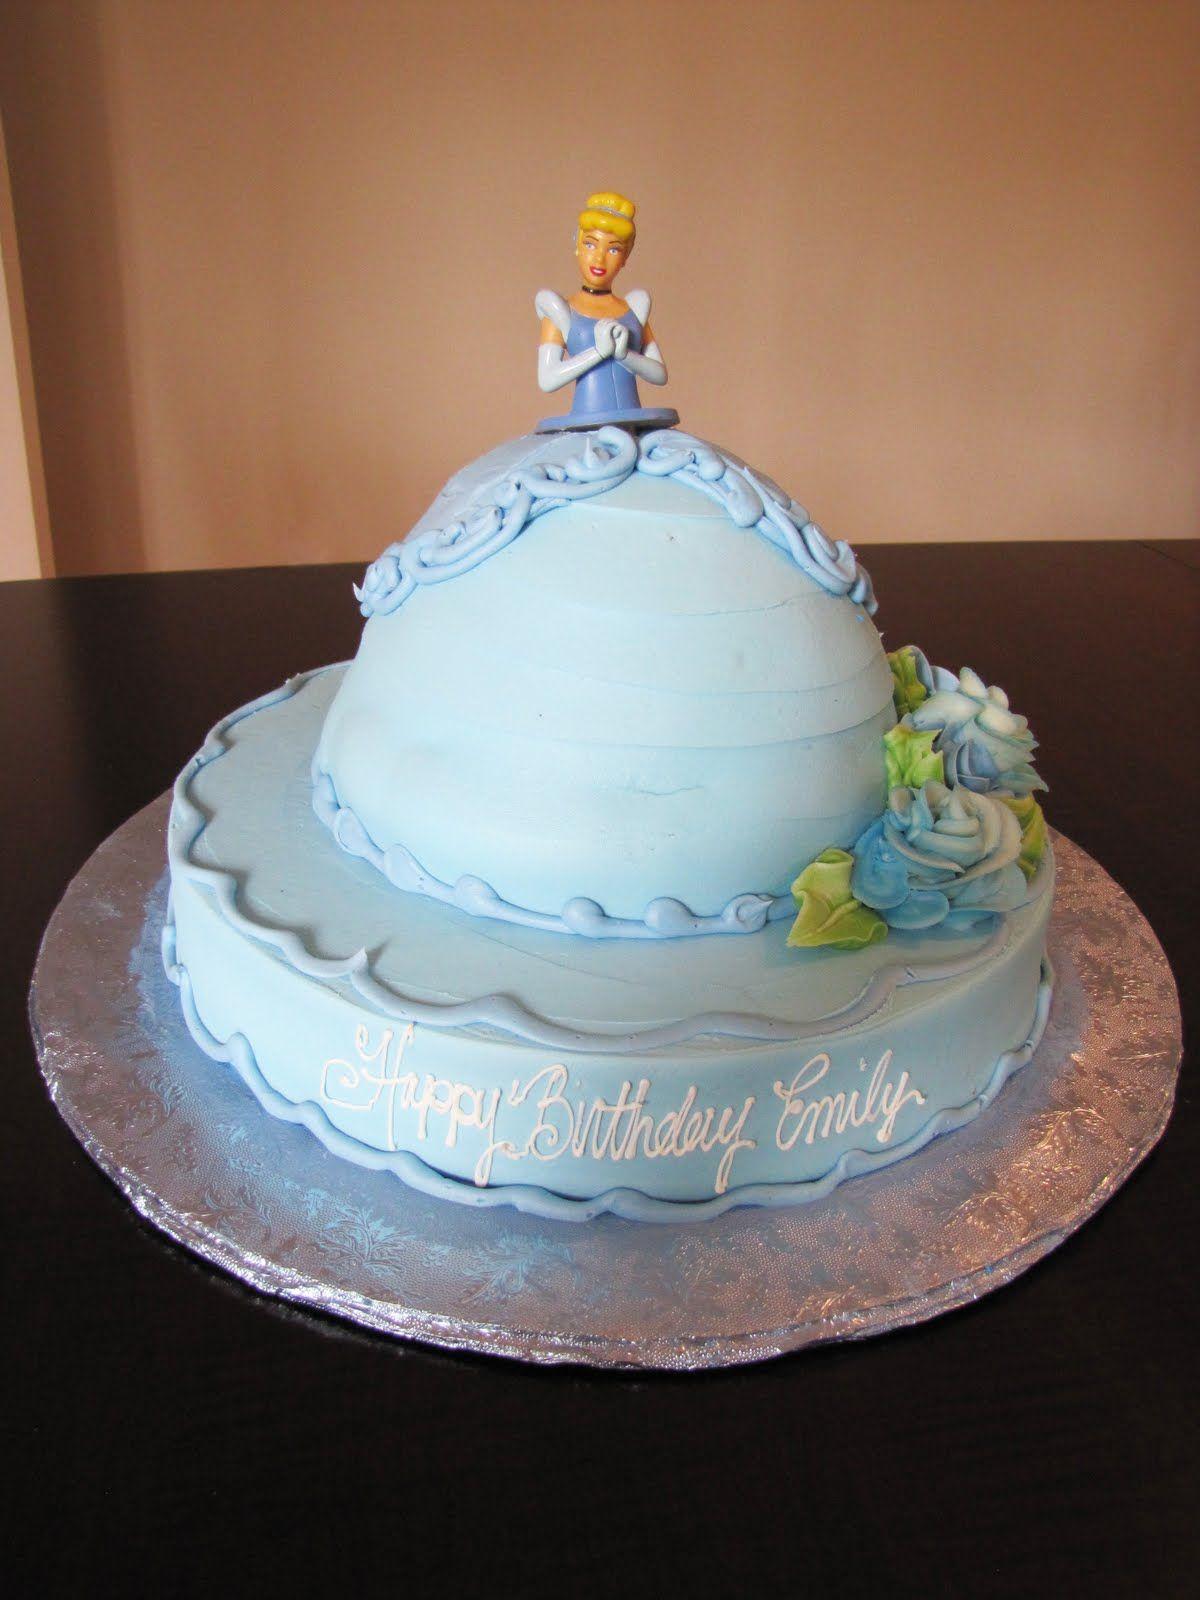 Cake Design Cinderella : Princess Cinderella Birthday Cake Cake ideas Pinterest